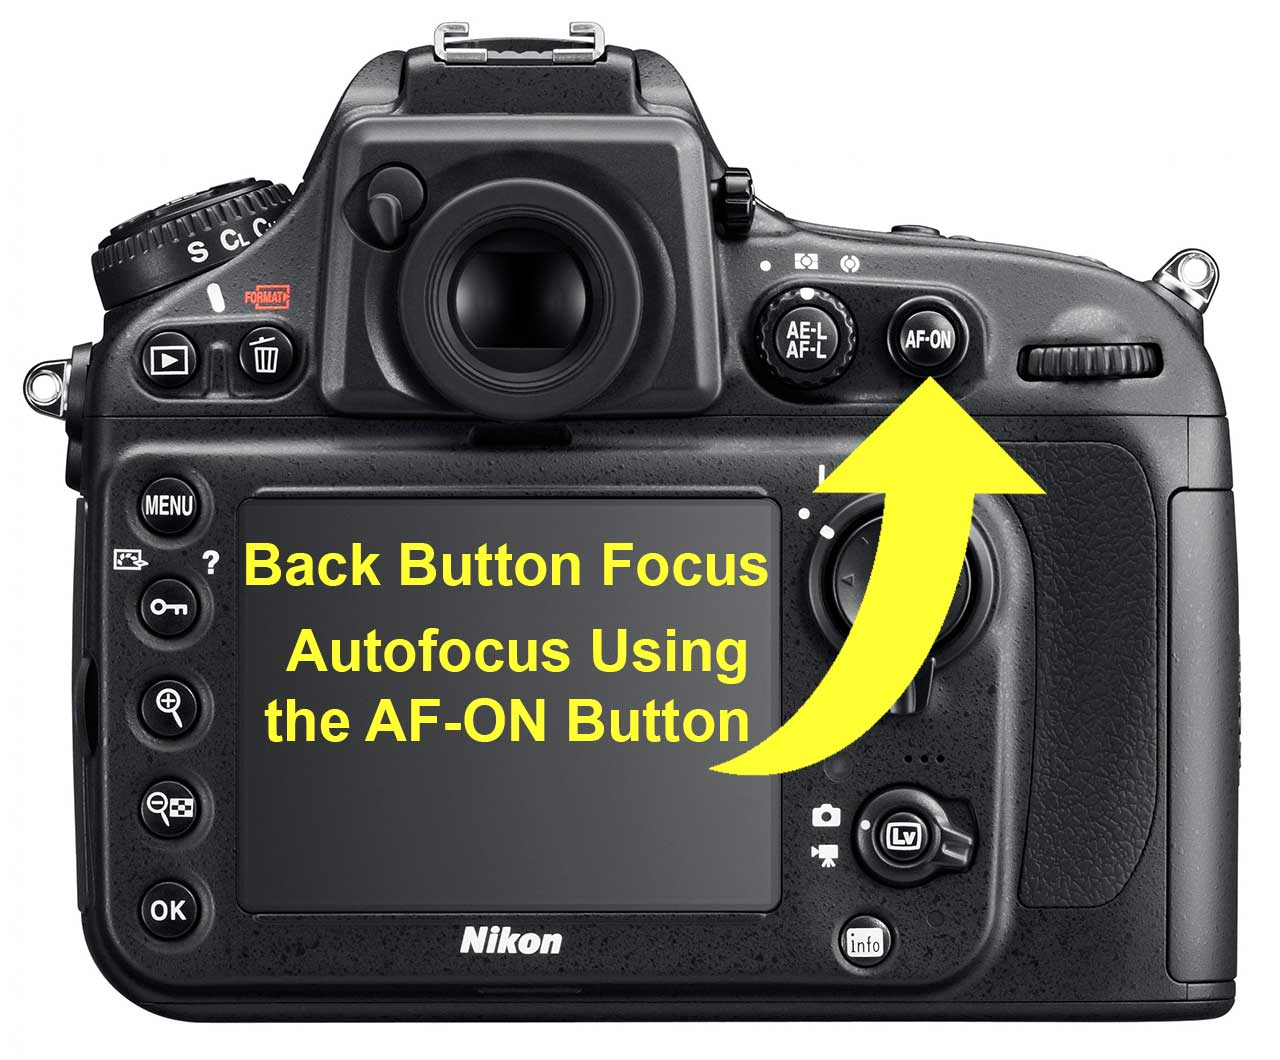 Back Button Focus Using Nikon AF-ON Button